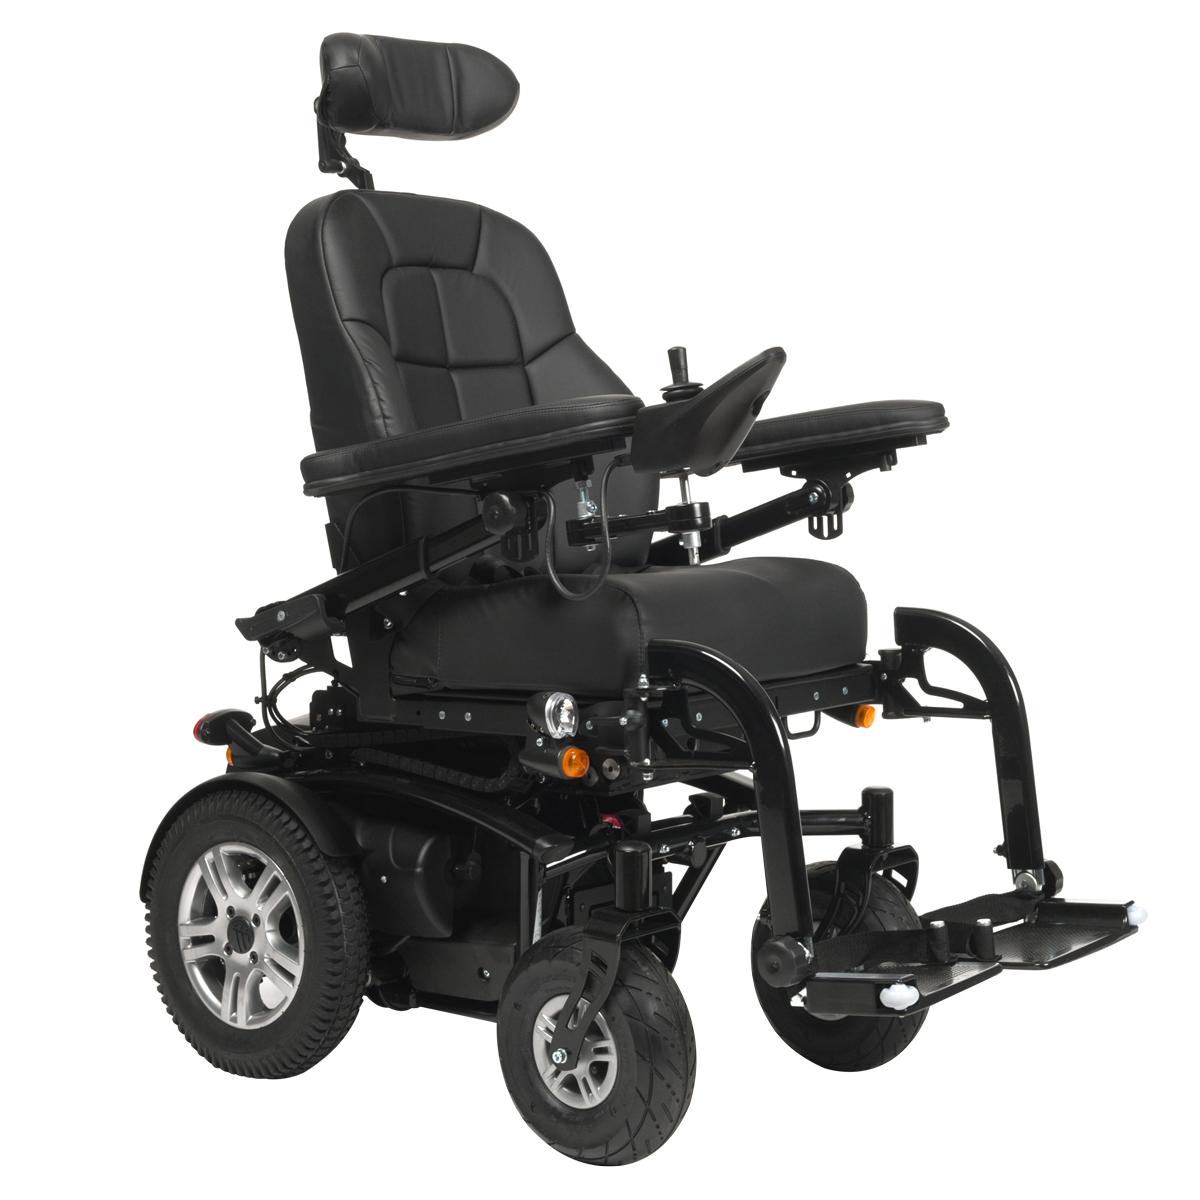 oxypharm fauteuil roulant lectrique forest 3. Black Bedroom Furniture Sets. Home Design Ideas